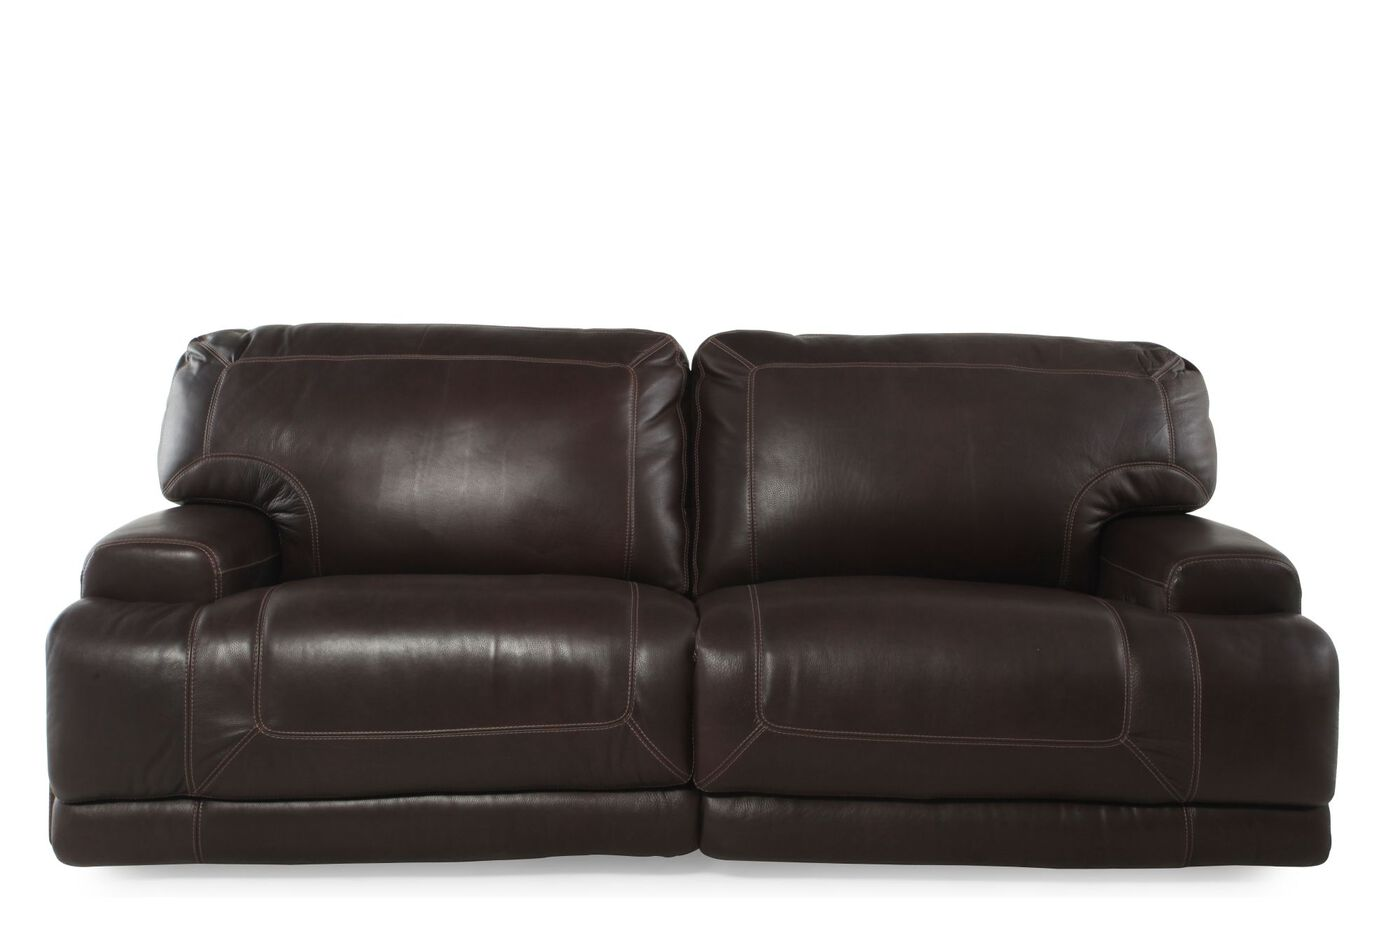 Best Leather Sofa Brands Australia